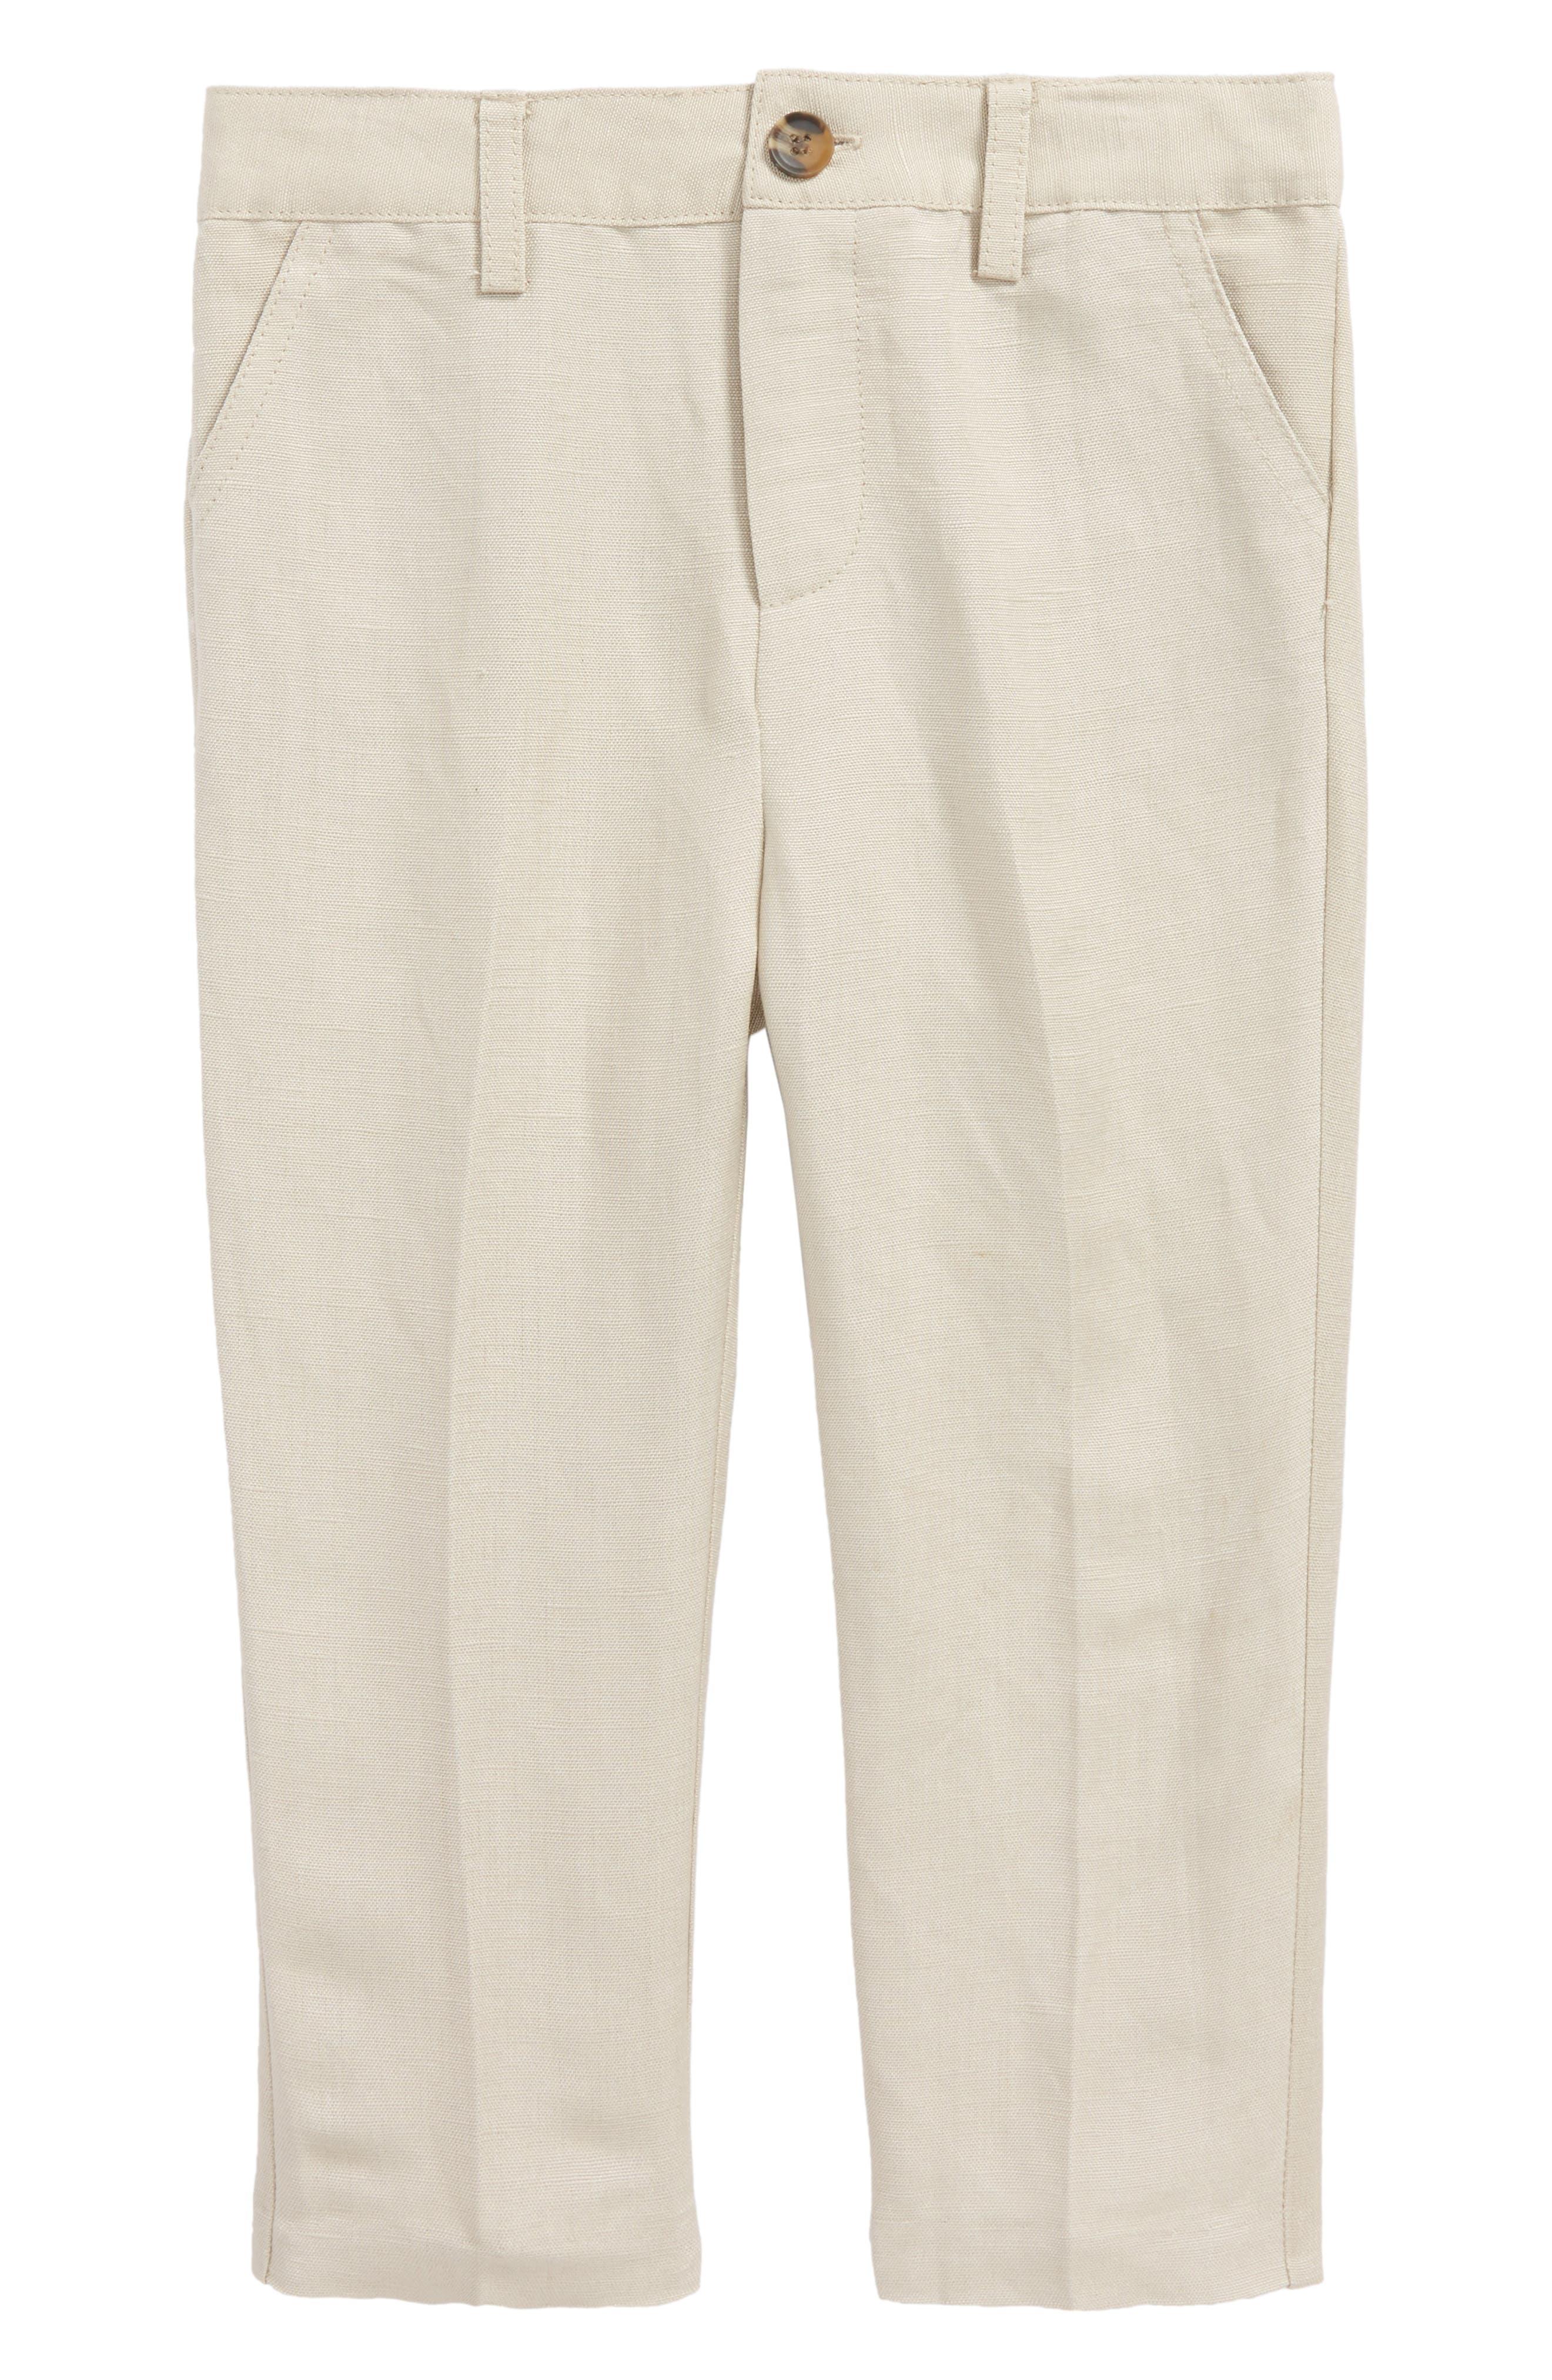 BARDOT JUNIOR,                             Miles Linen Blend Dress Pants,                             Main thumbnail 1, color,                             277